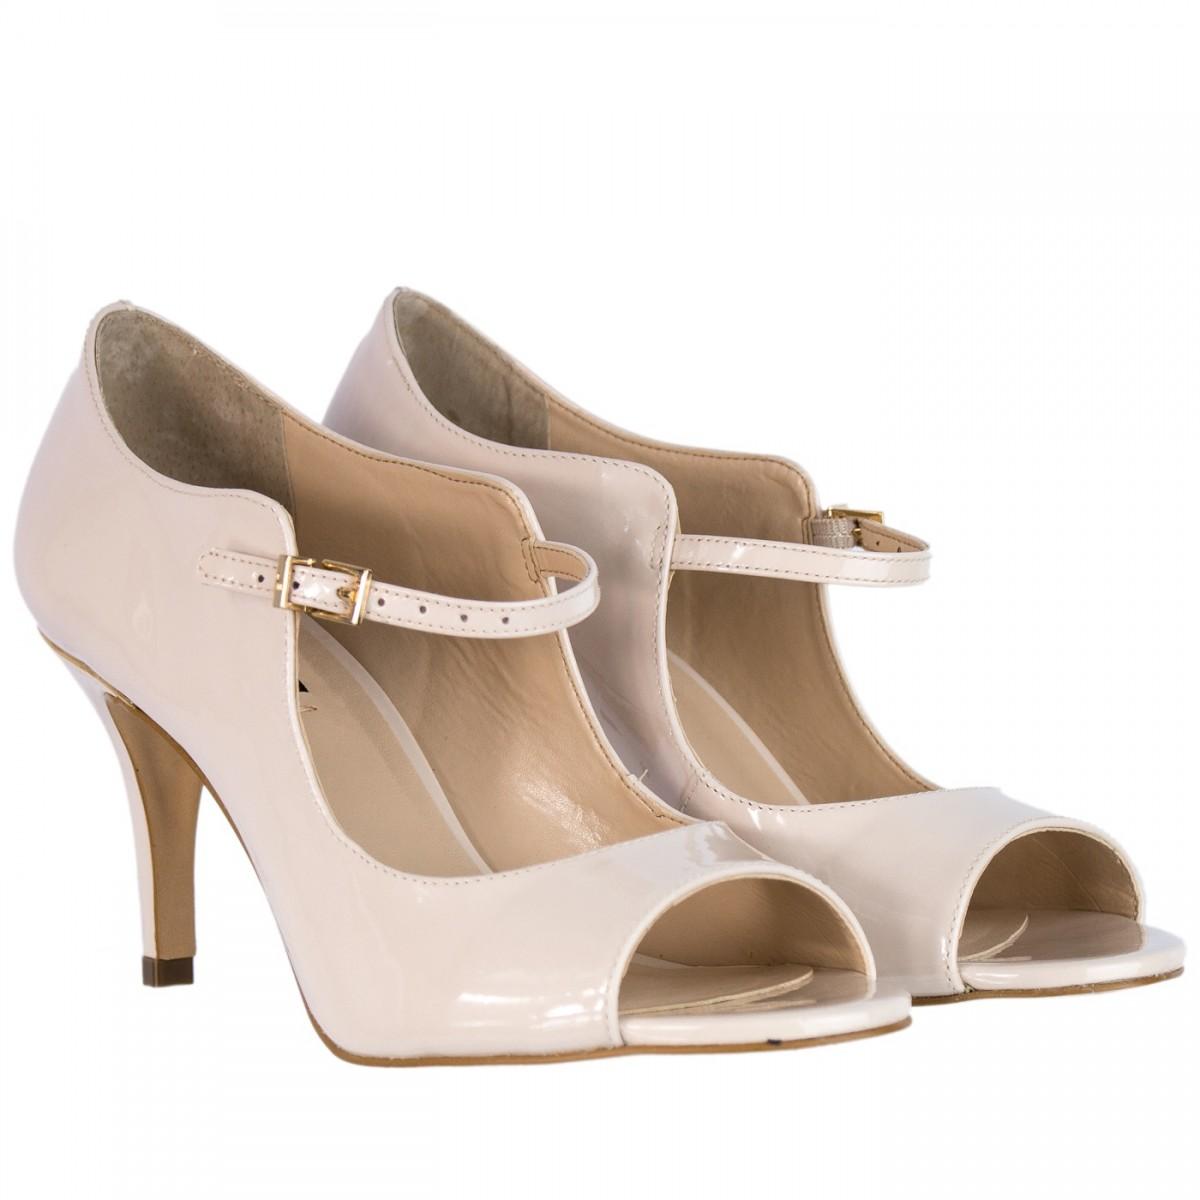 42923fe432 Bizz Store - Sapato Peep Toe Feminino Jorge Bischoff Verniz Nude